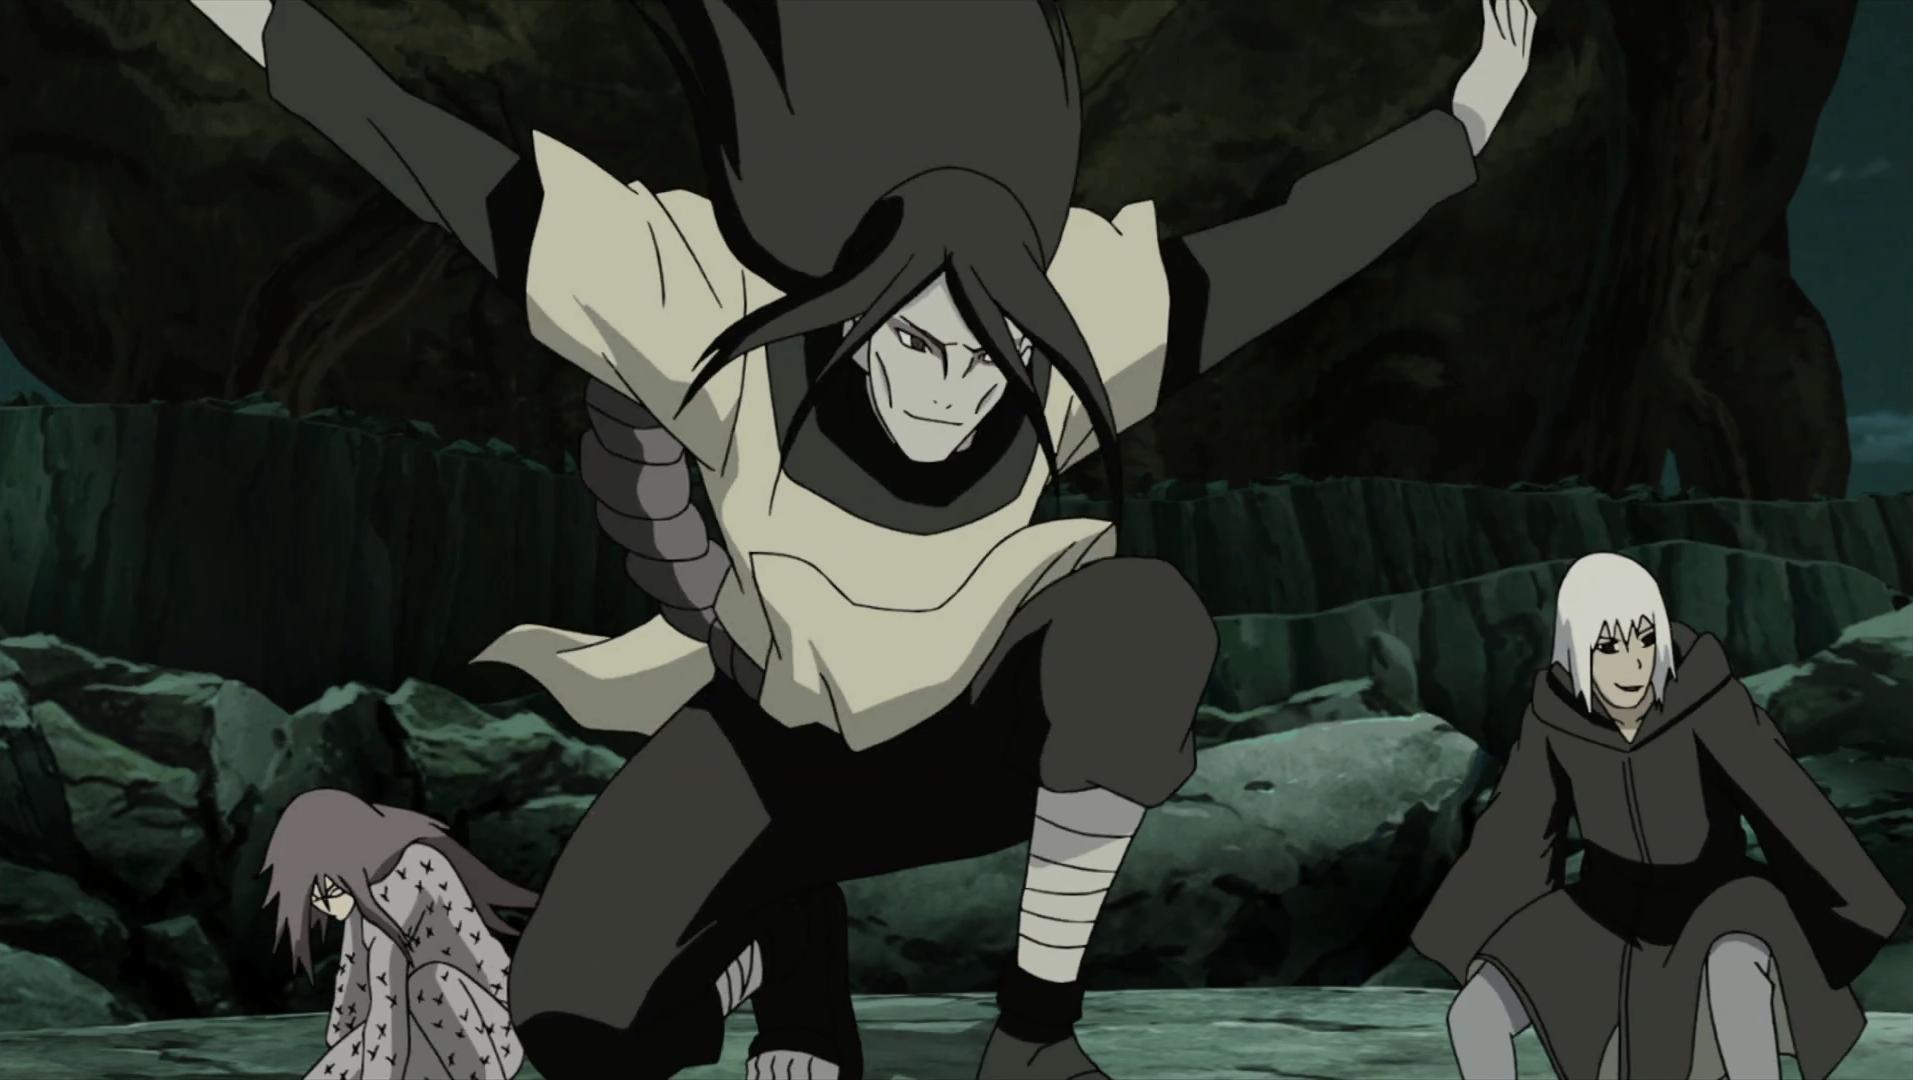 Orochimaru | Narutopedia | FANDOM powered by Wikia